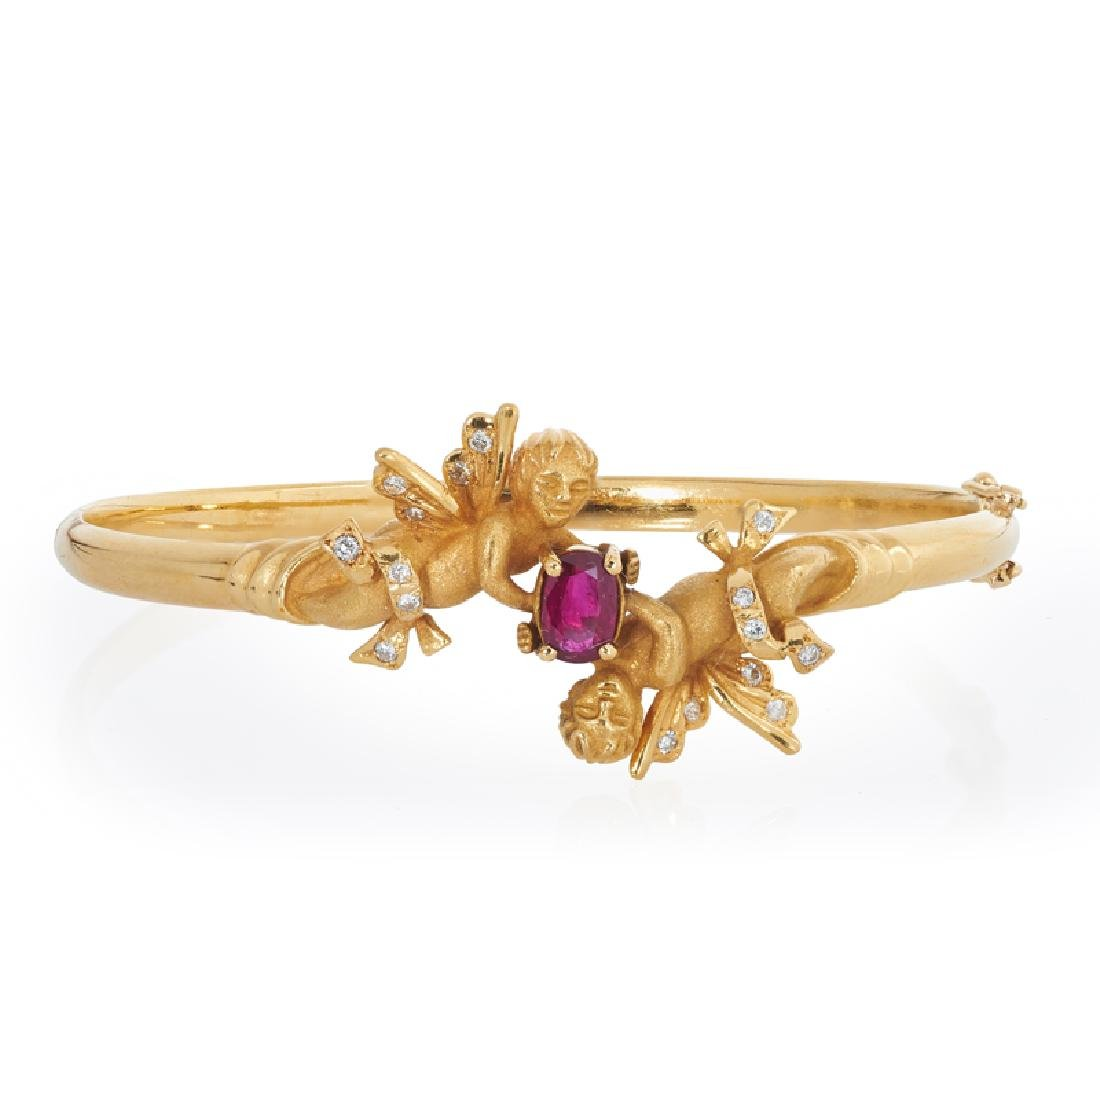 RUBY, DIAMOND & YELLOW GOLD CHERUB BANGLE BRACELET